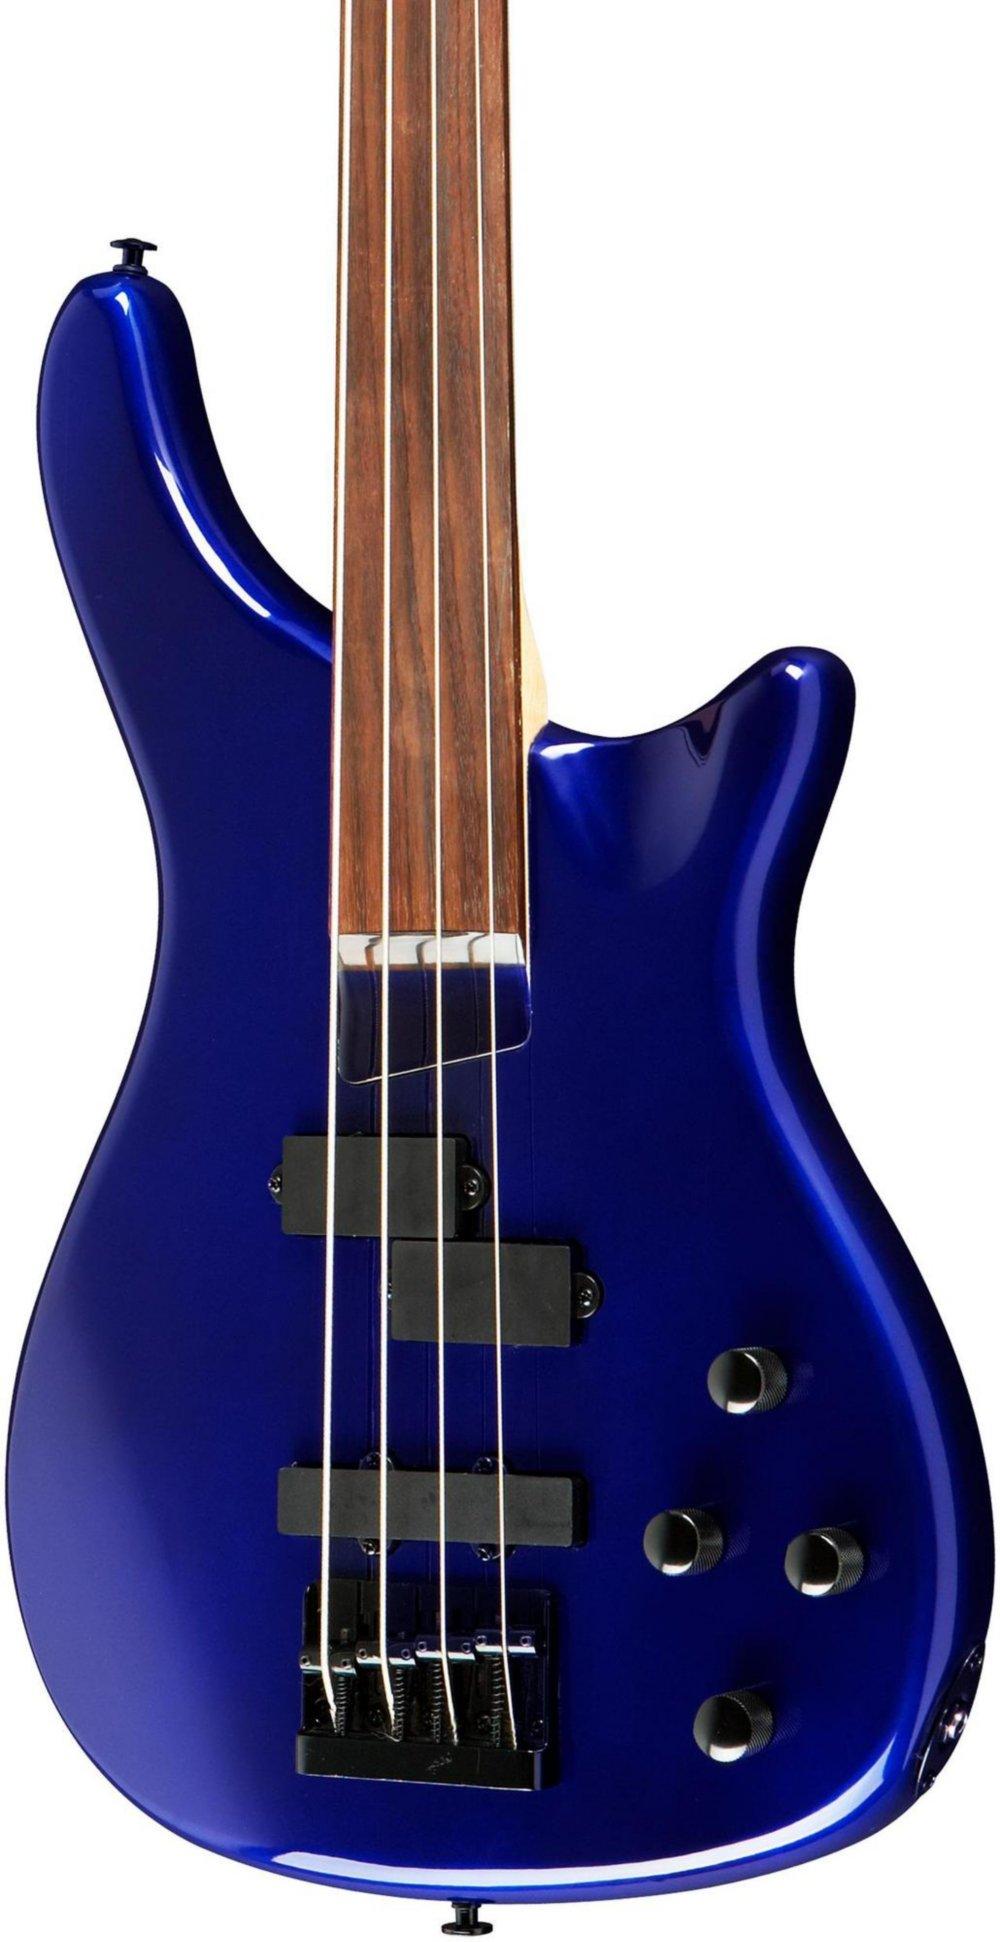 Cheap Rogue LX200BF Fretless Series III Electric Bass Guitar Metallic Blue Black Friday & Cyber Monday 2019